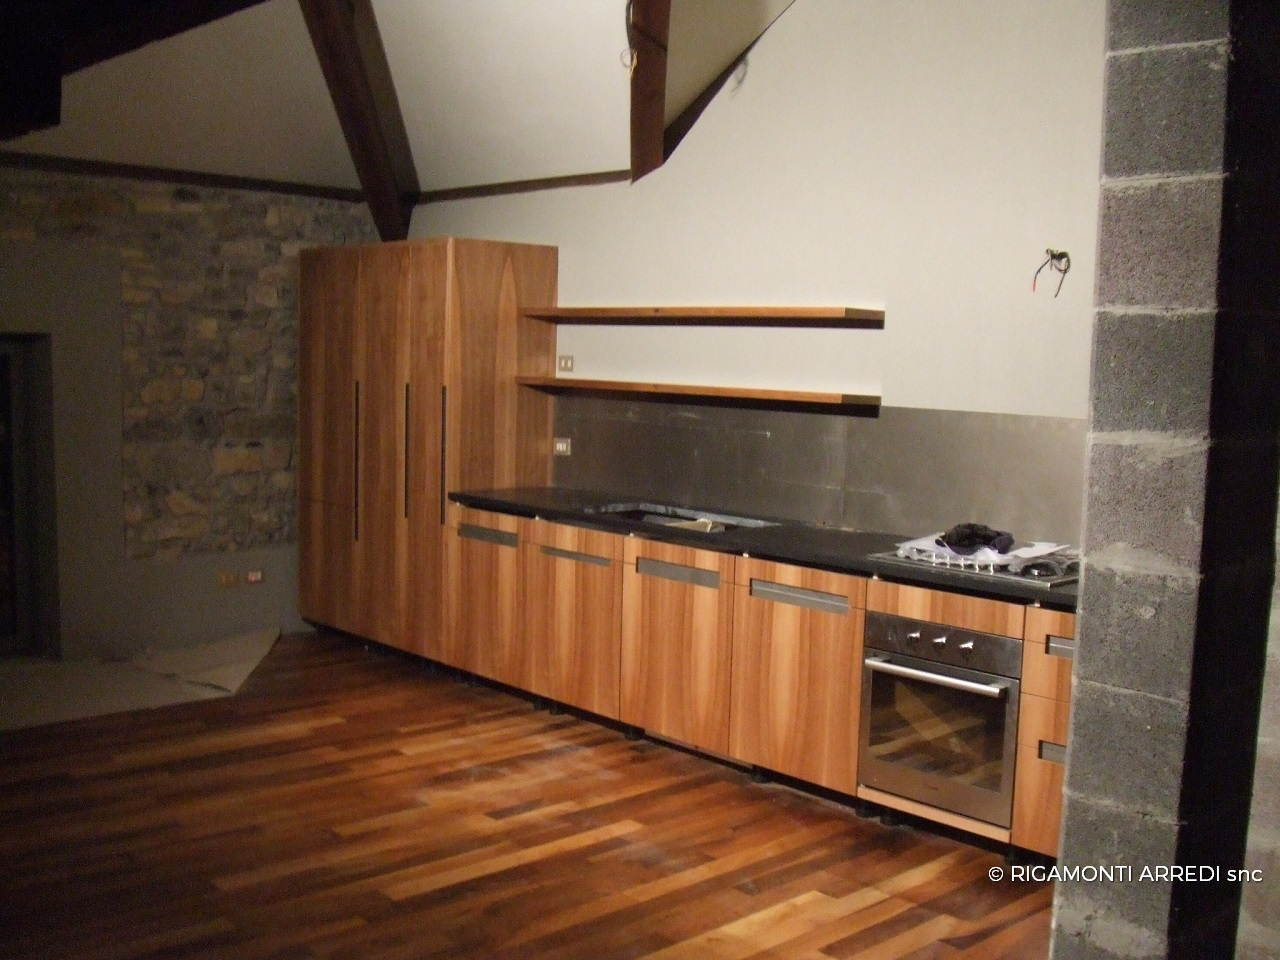 Cucina studiolo e ingresso in legno noce nazionale - Cucina bianca e noce ...